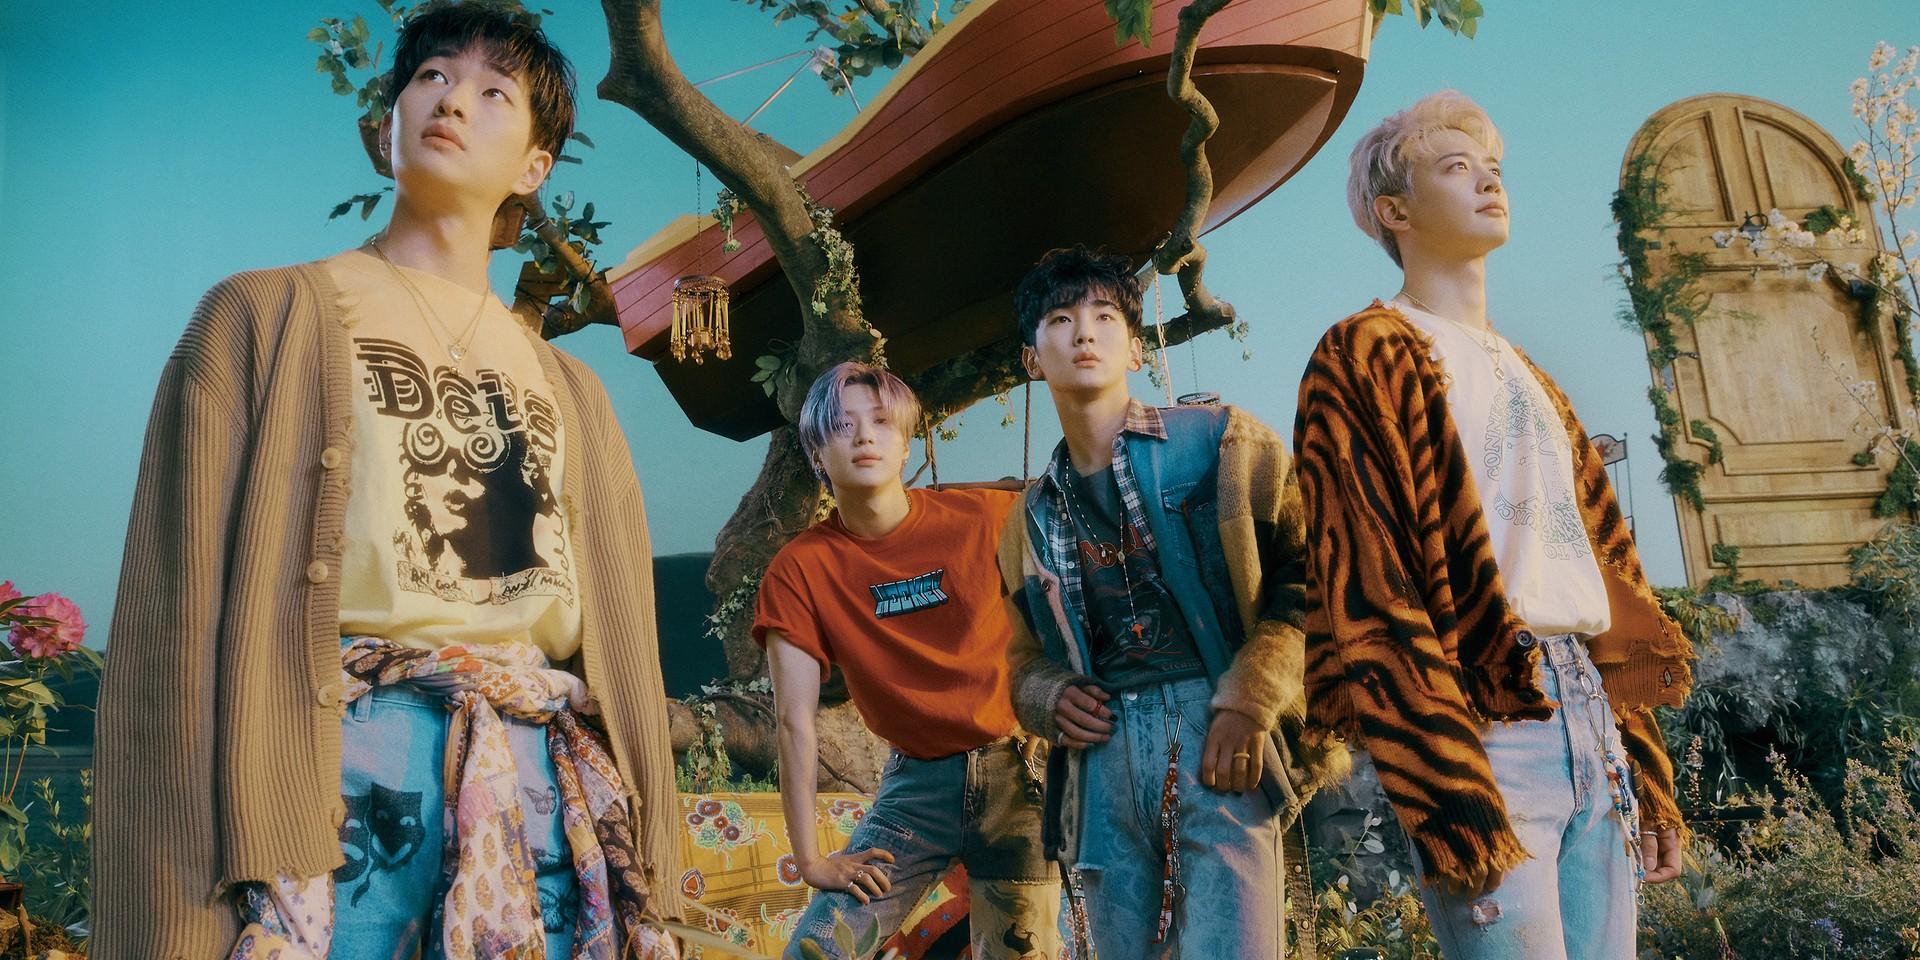 SHINee release repackaged seventh album 'Atlantis' – listen